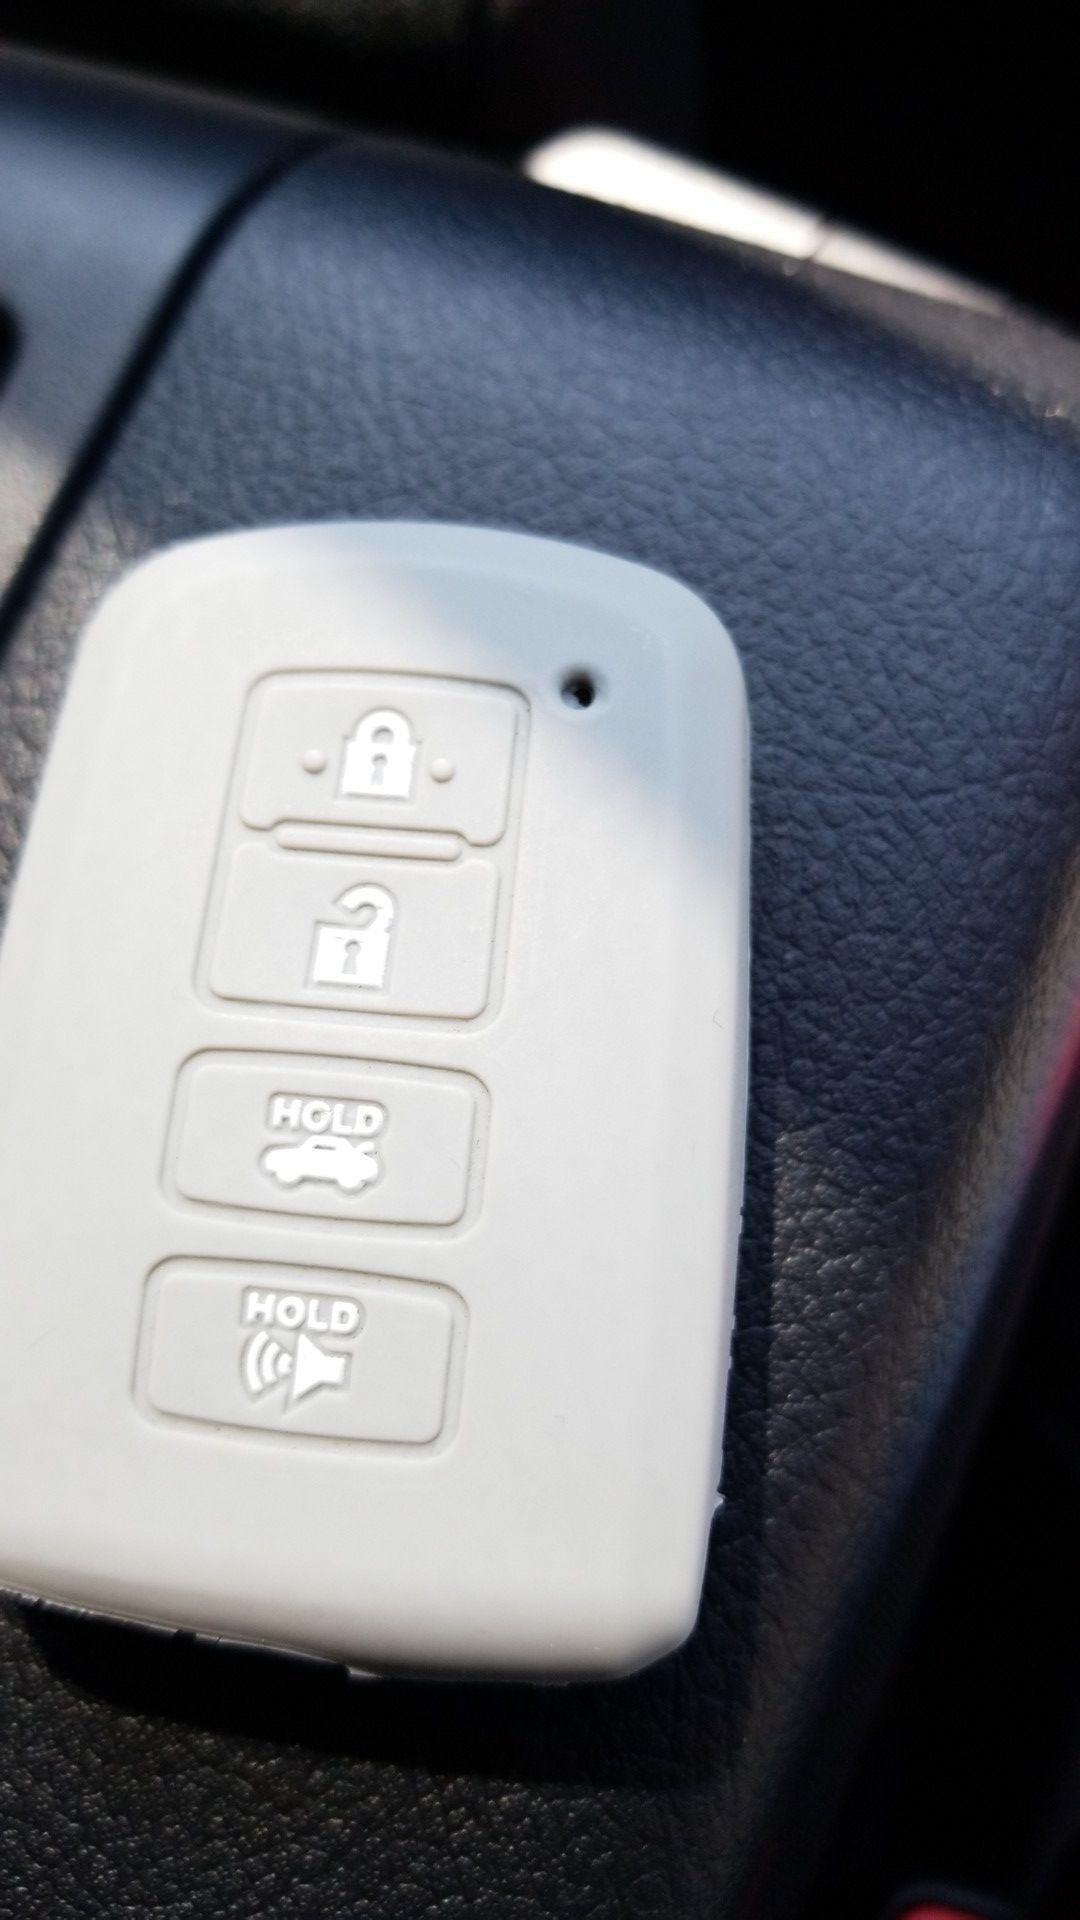 Para control d llave d Toyota Camry año 2015